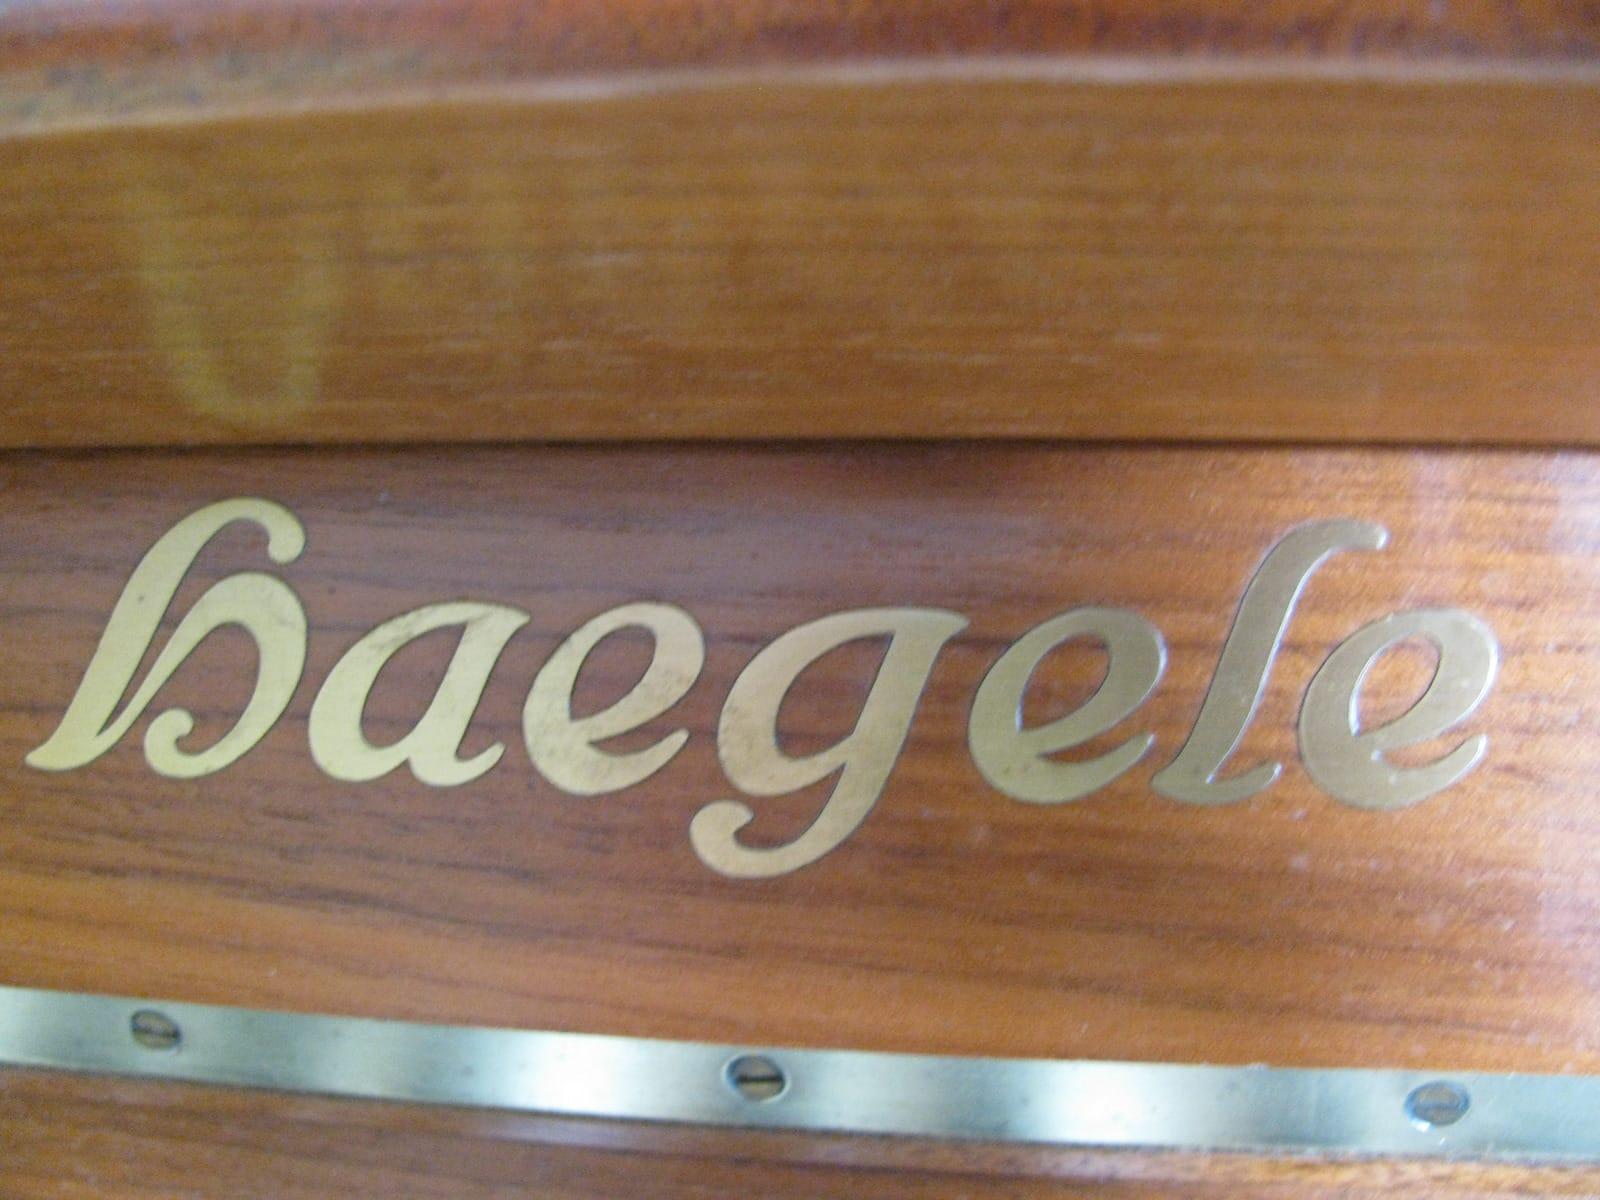 Haegele Klavier (warburg)